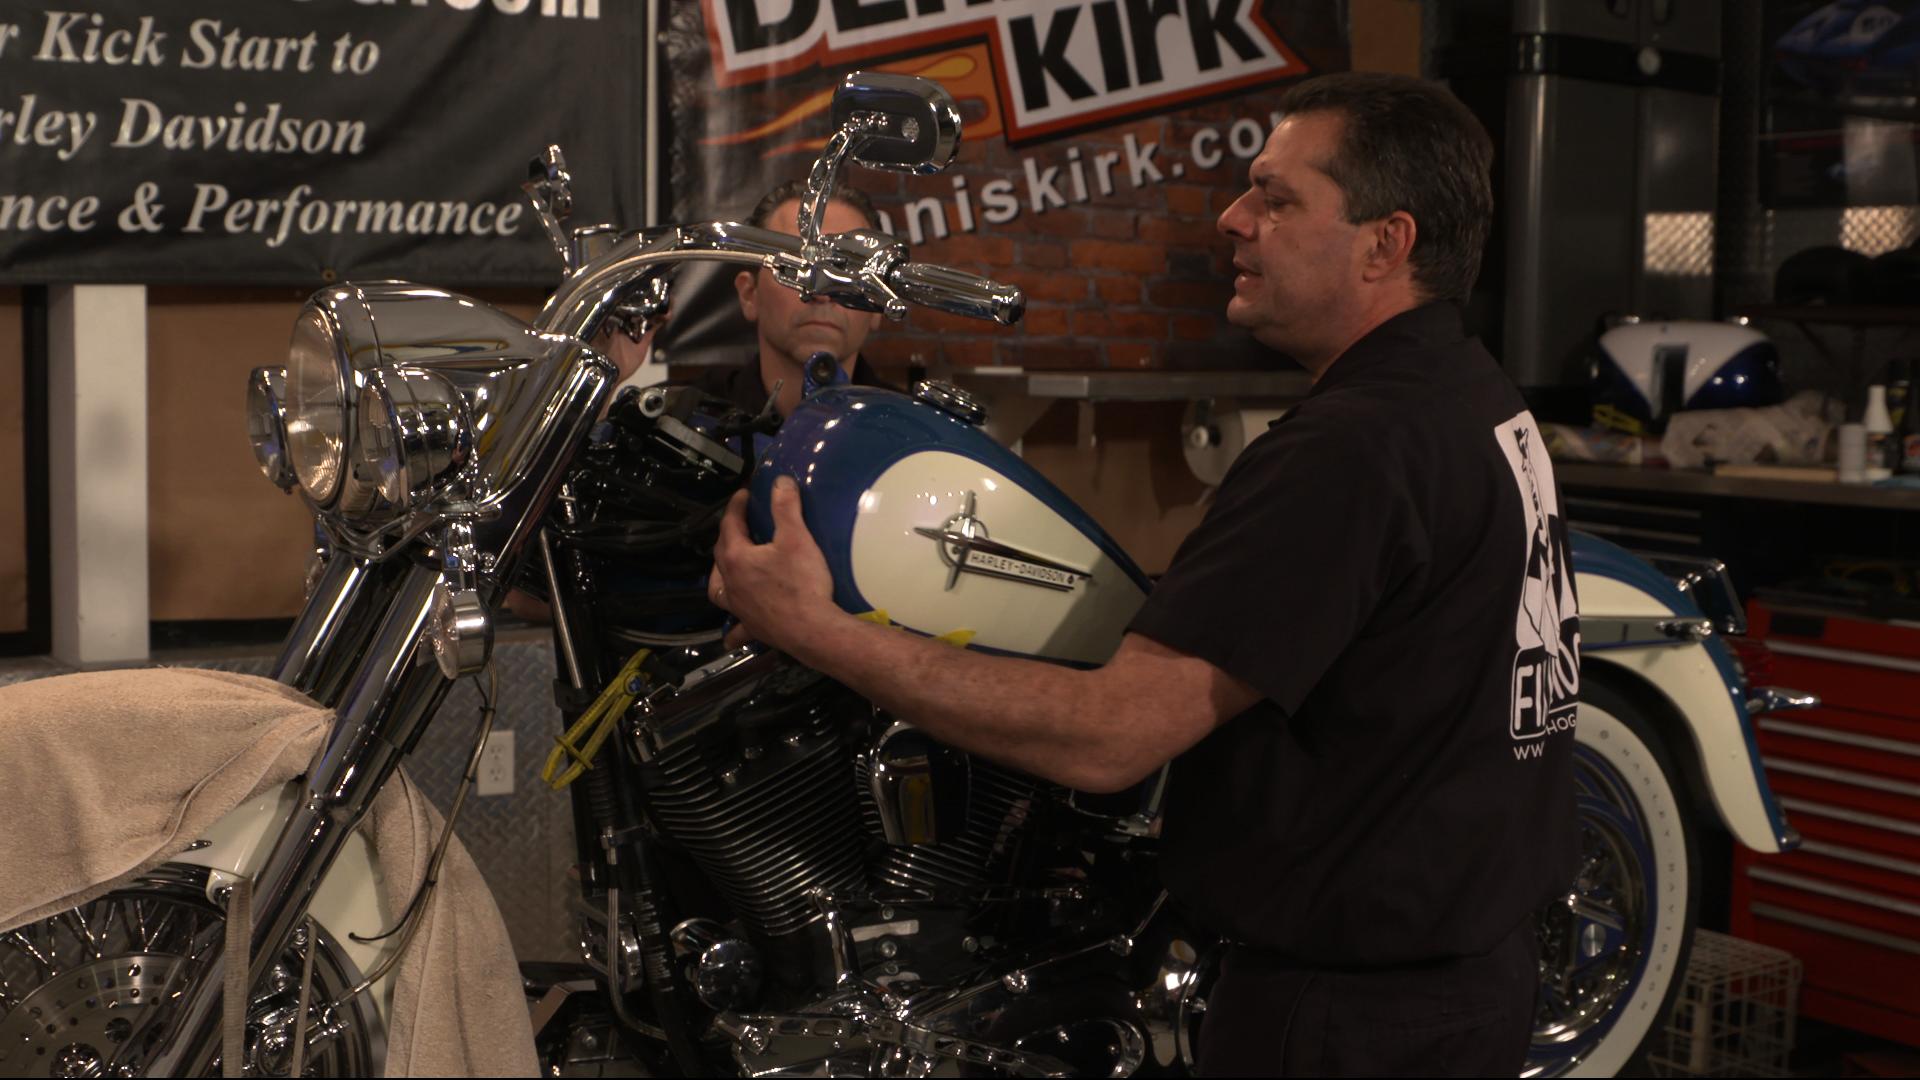 Evo 2 Piece Harley Davidson Fuel Tank Removal